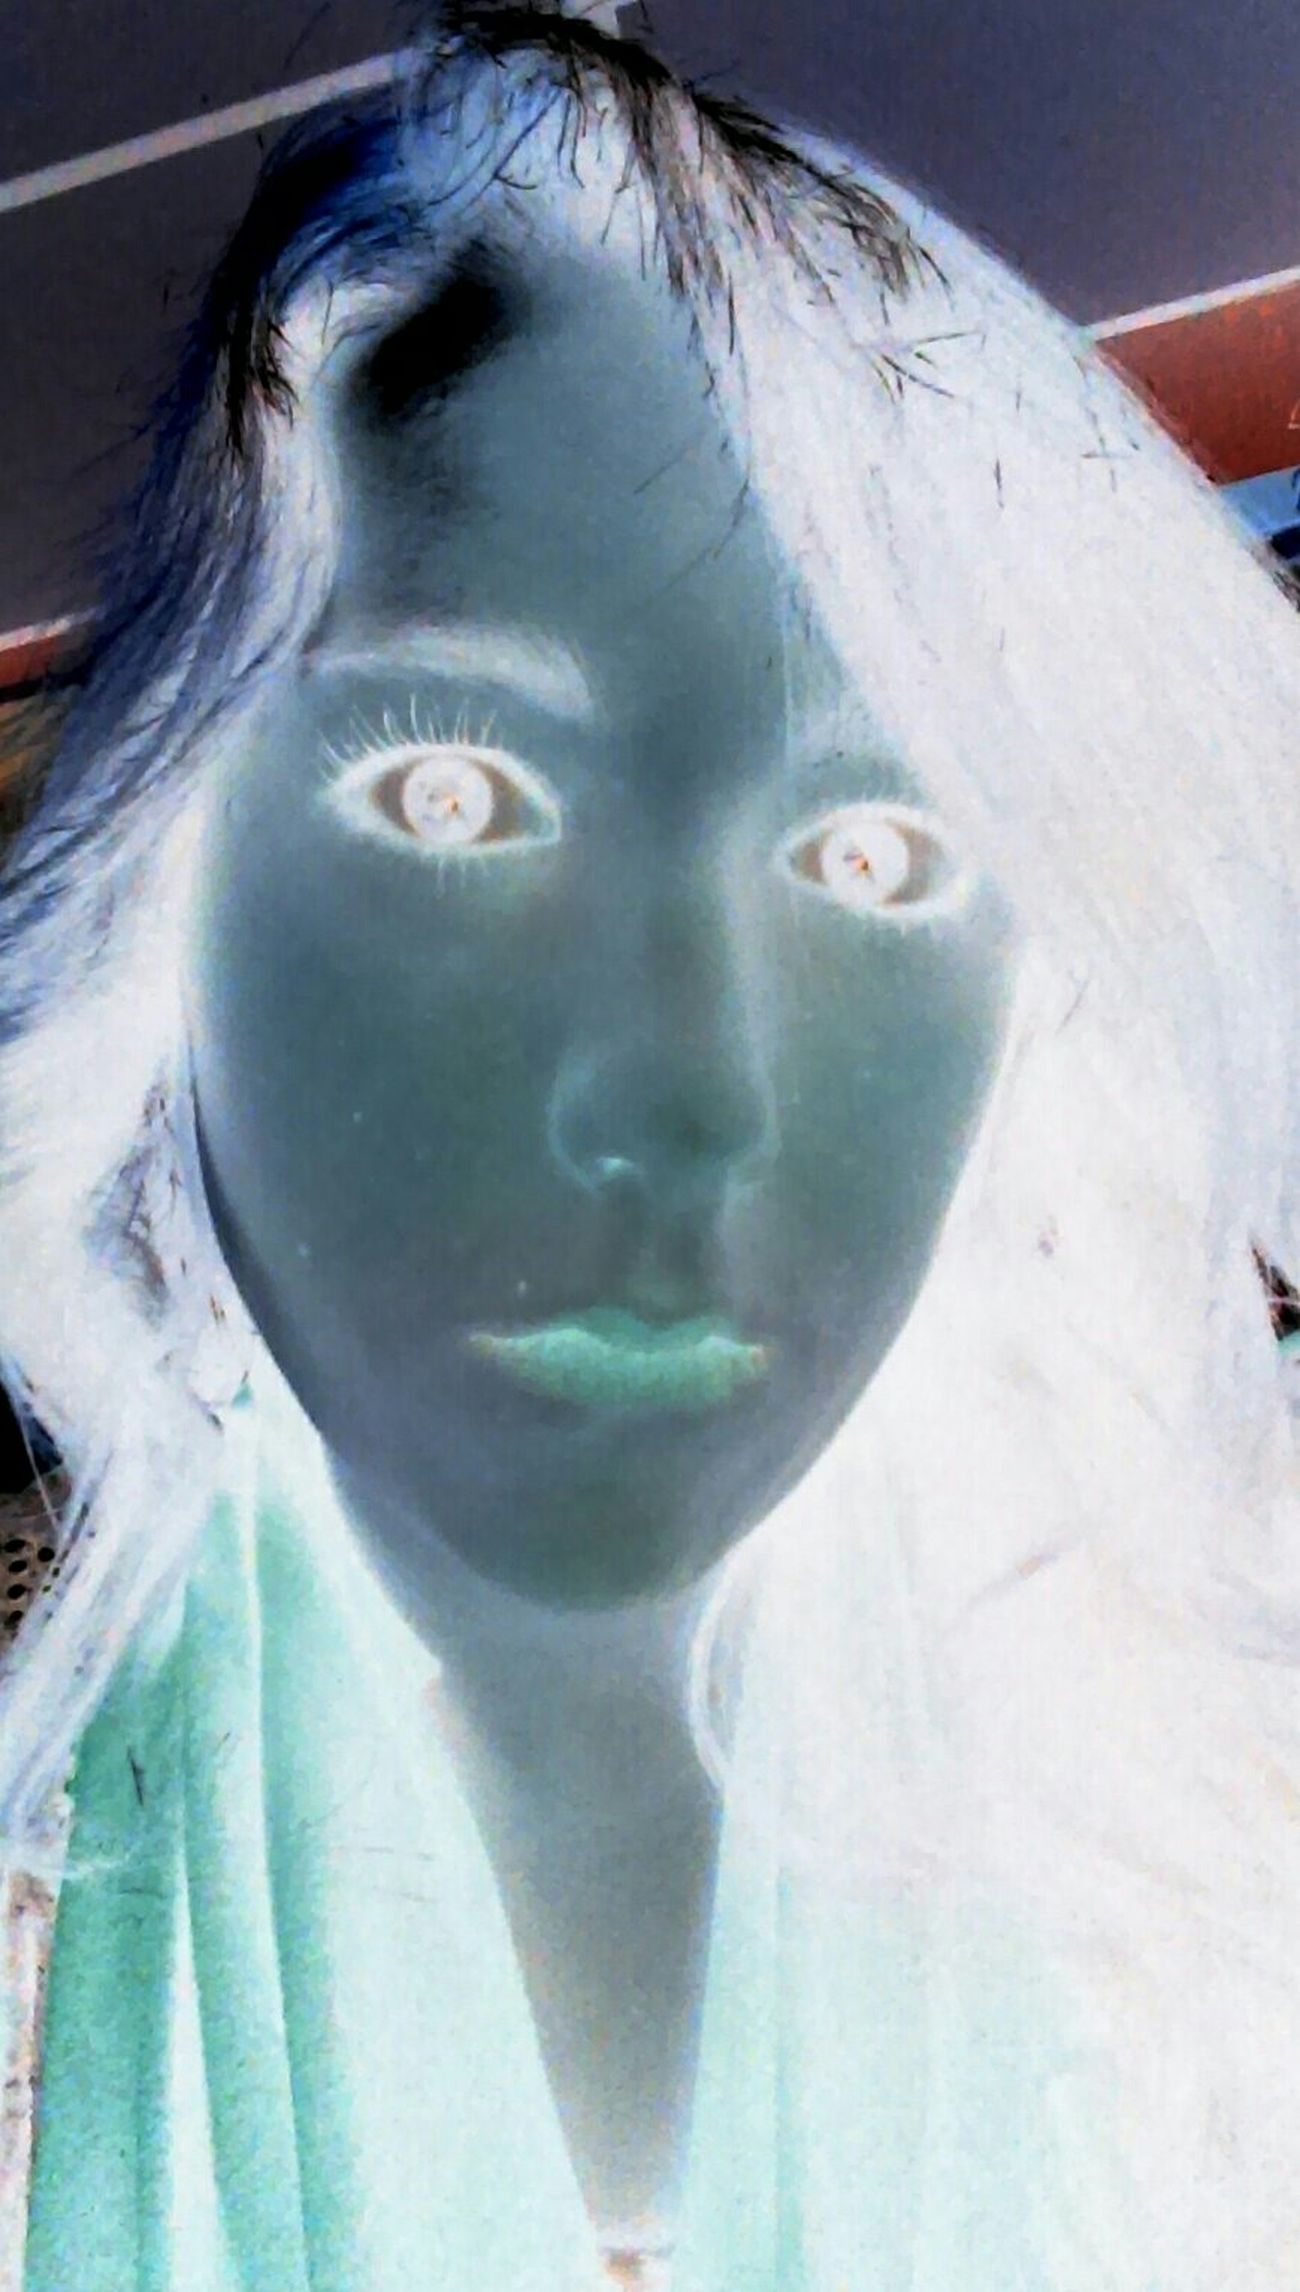 Neons Look Into My Eyes...